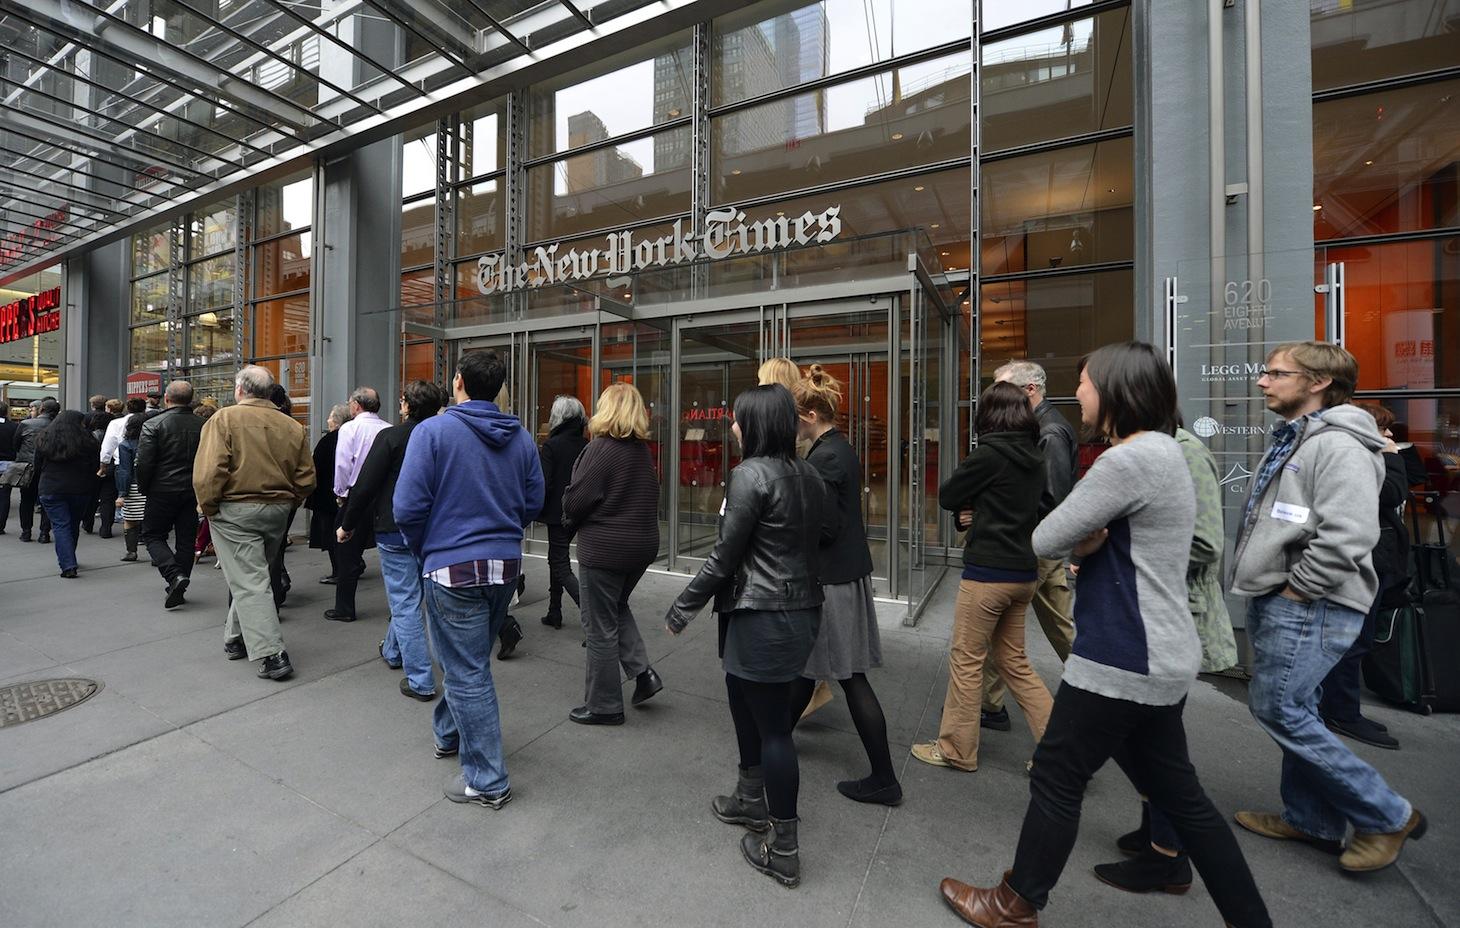 US-MEDIA-NYT WALKOUT